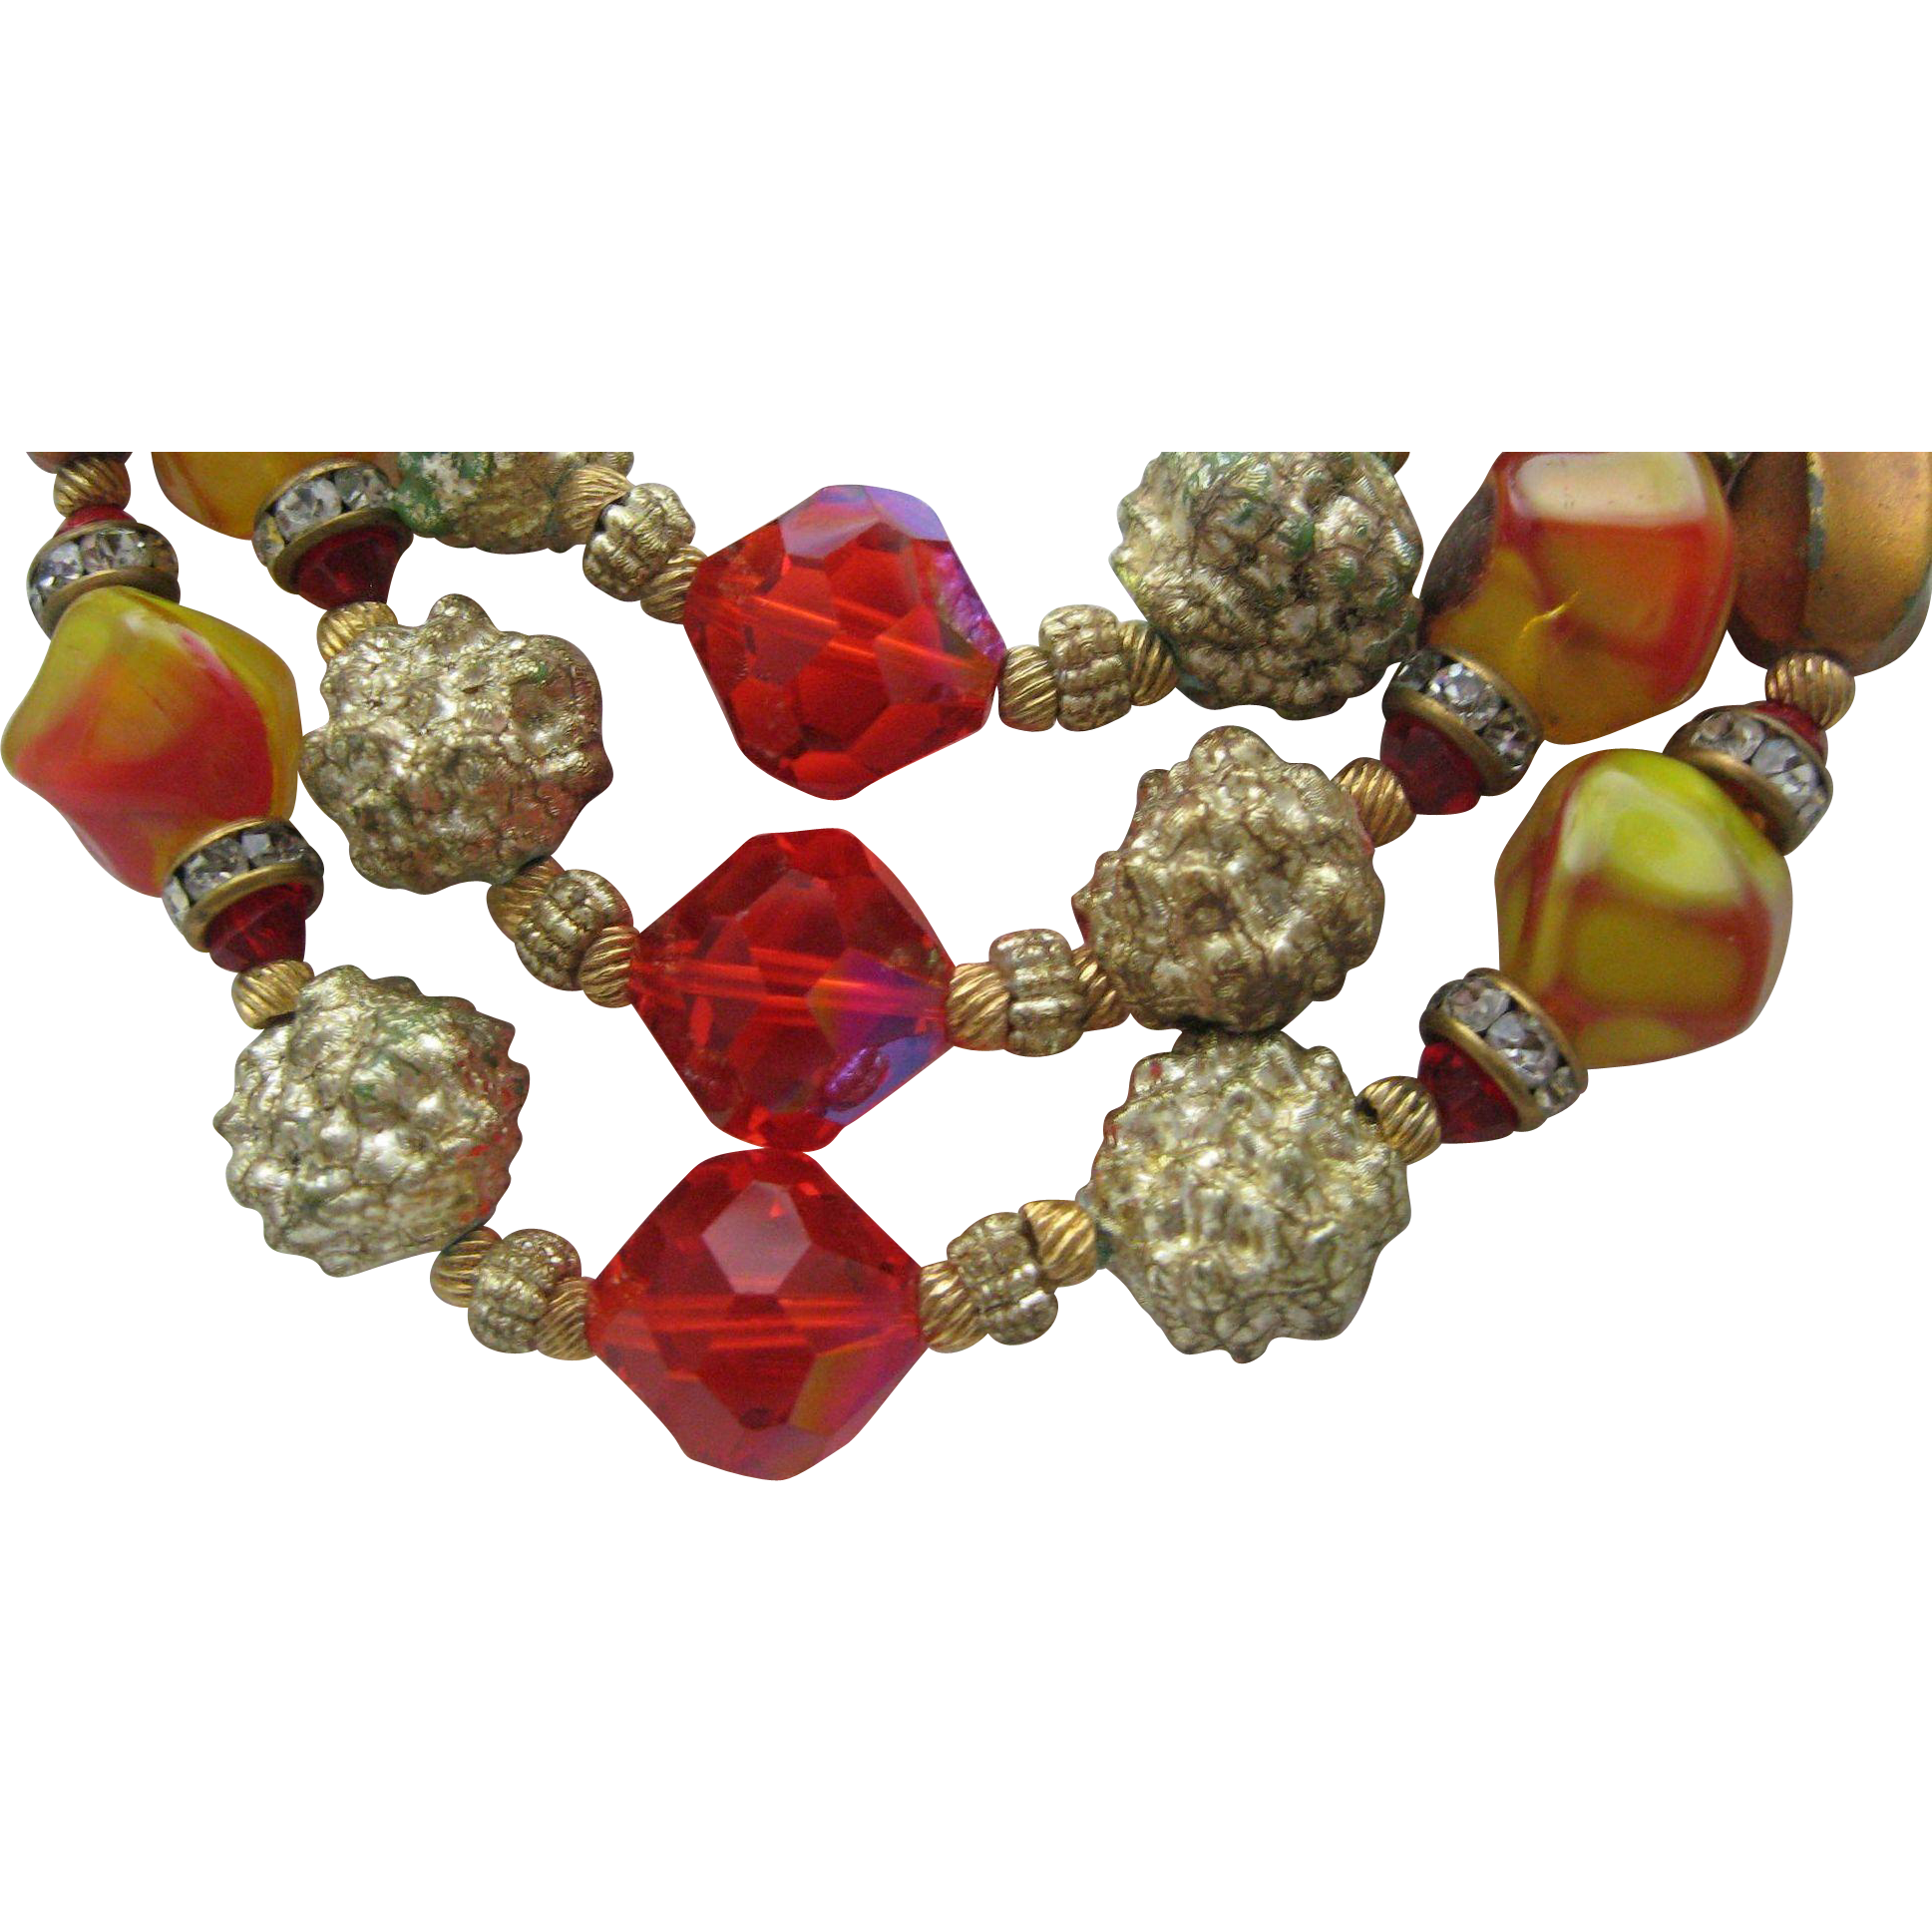 1950 Crystal Art Glass Choker Necklace